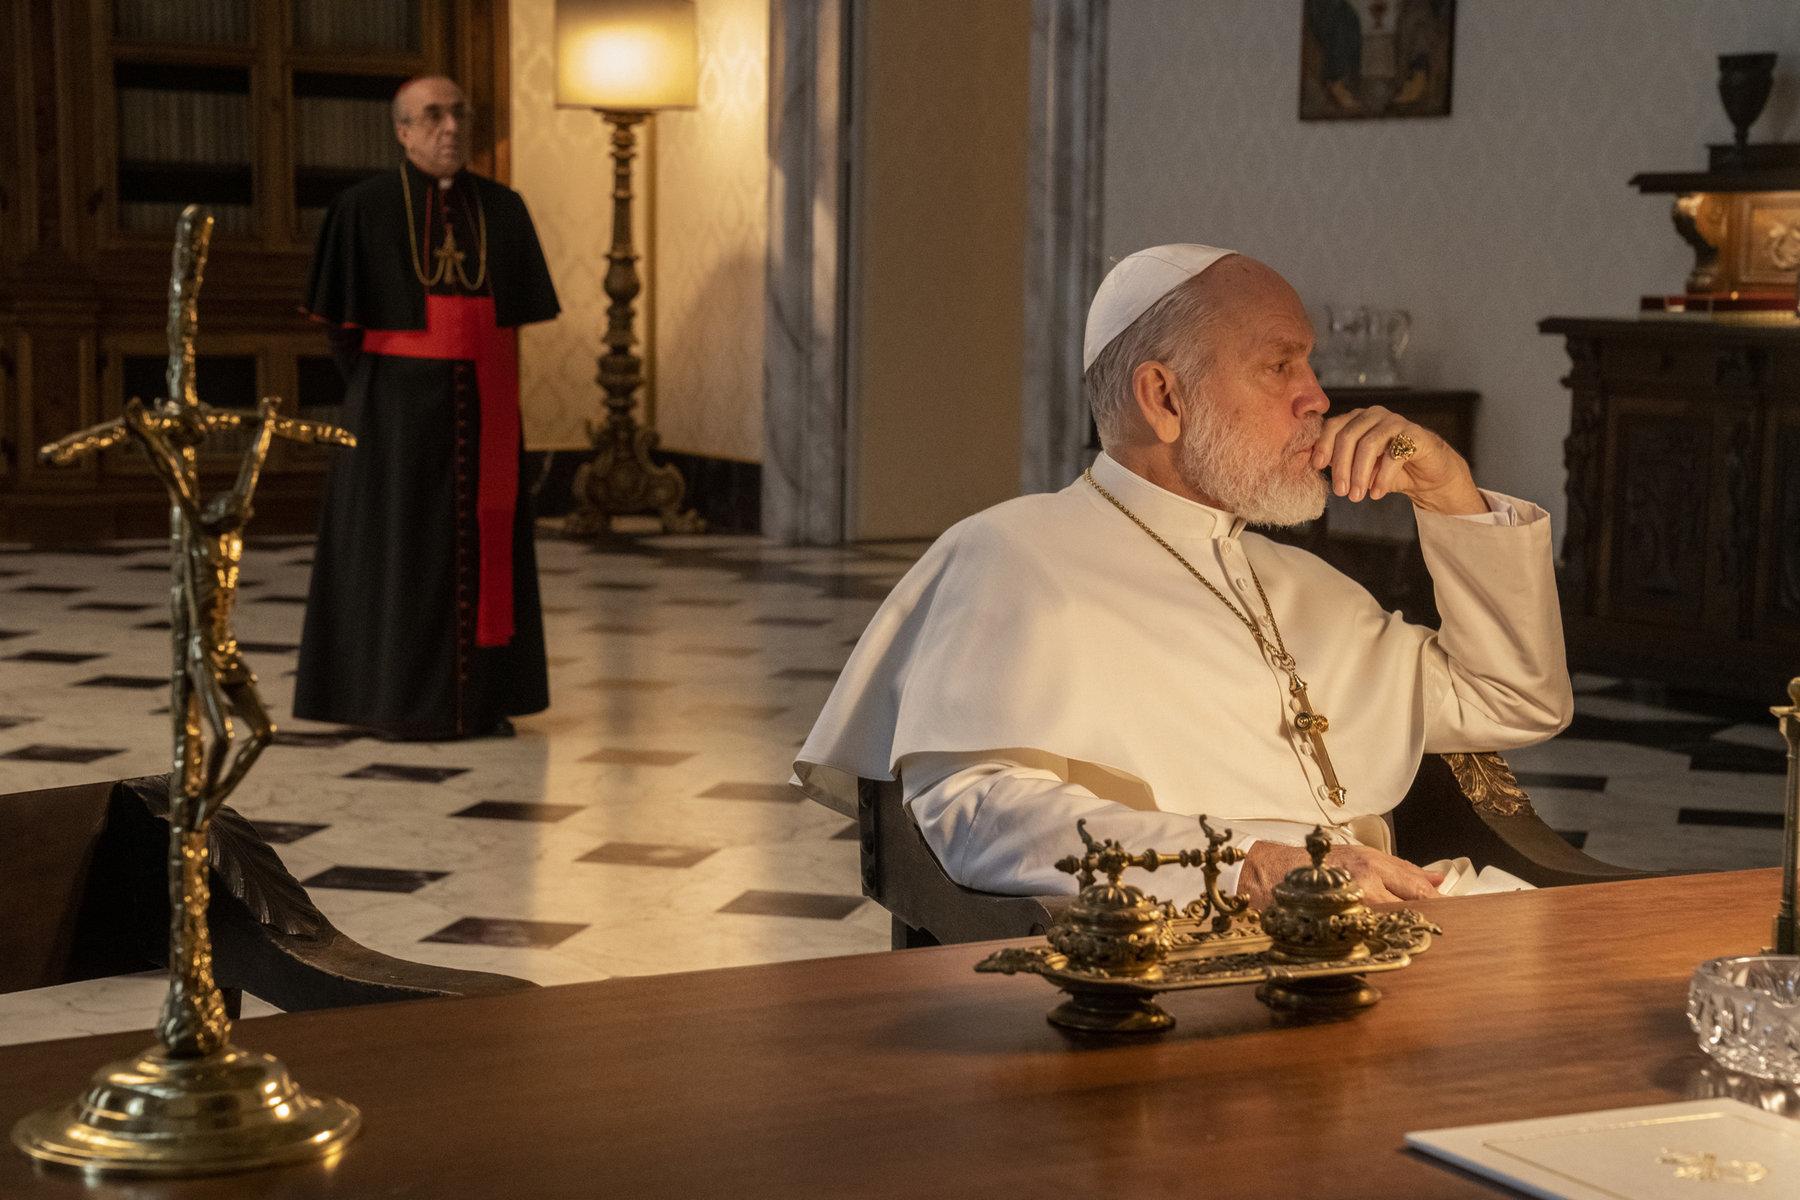 Jauns pāvests, The New Pope